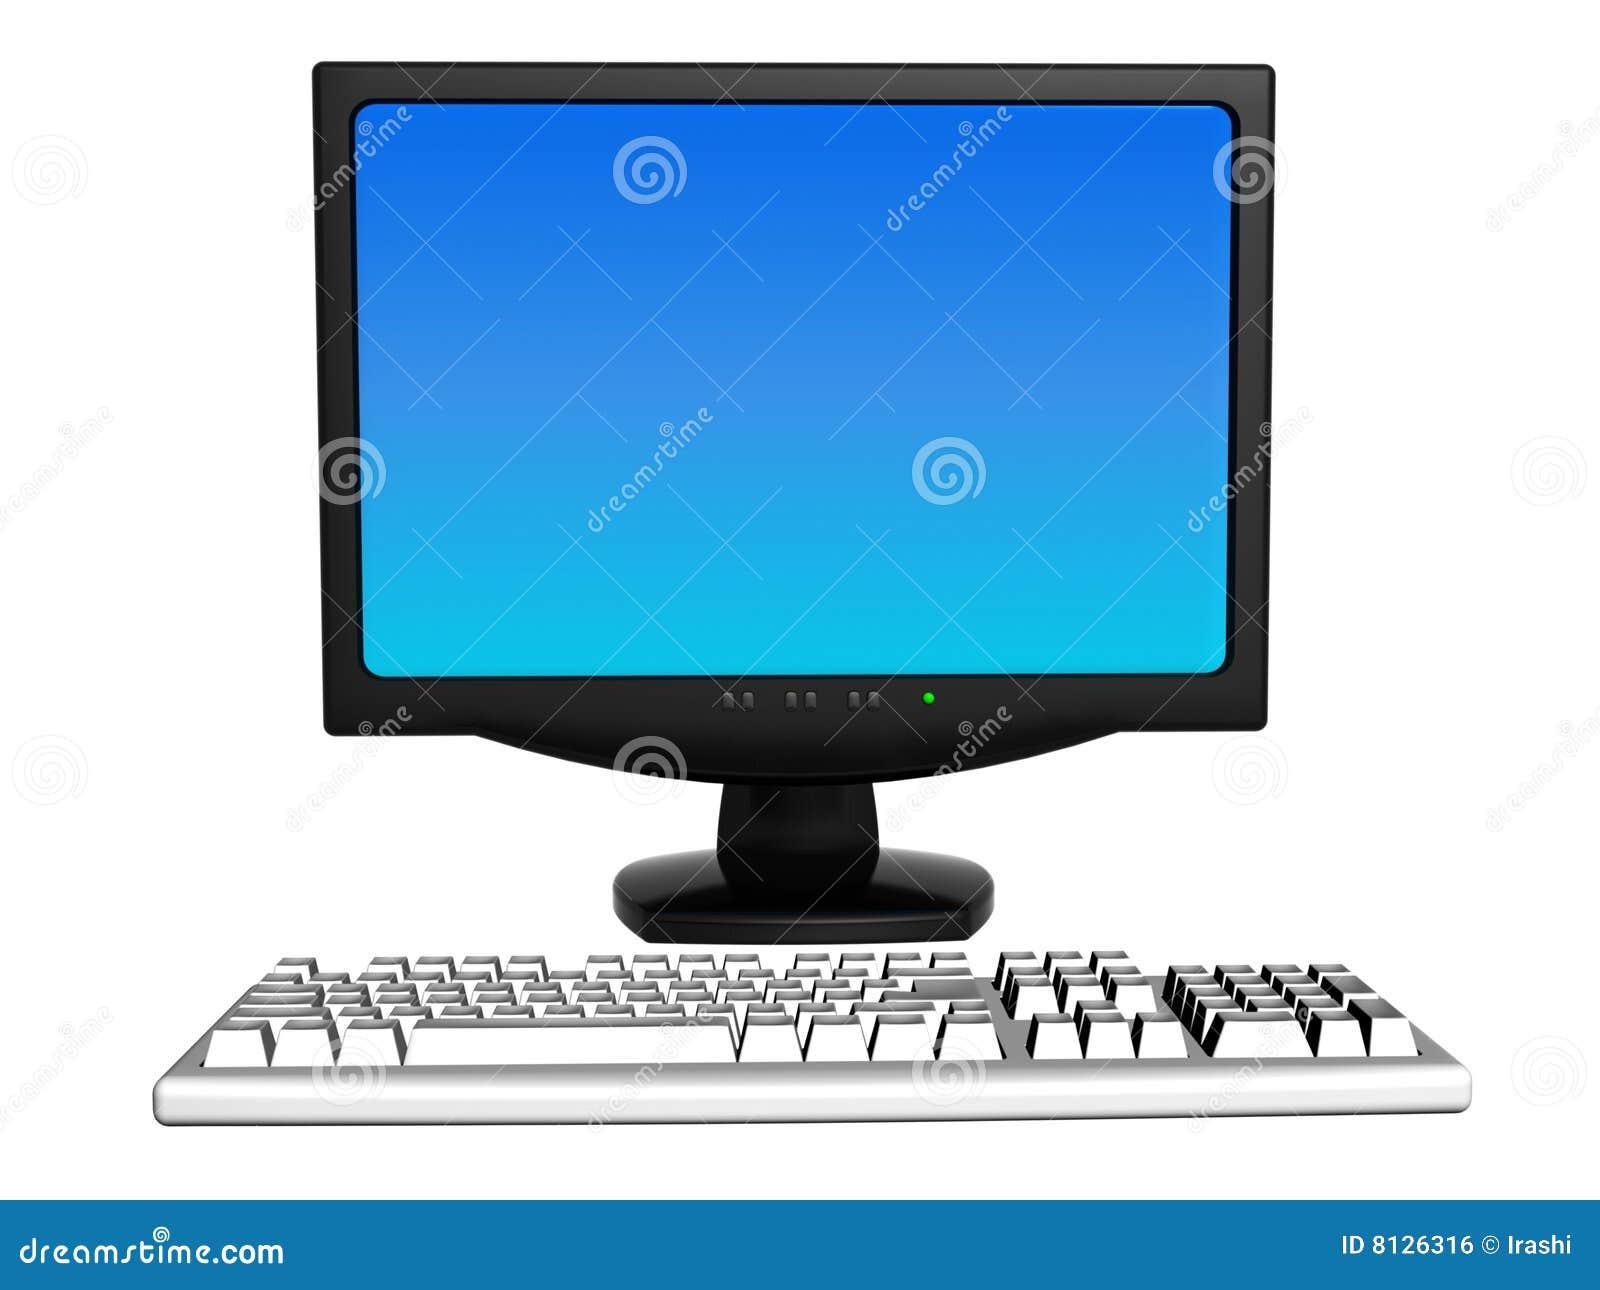 Monitor And Keyboard Royalty Free Stock Image - Image: 8126316